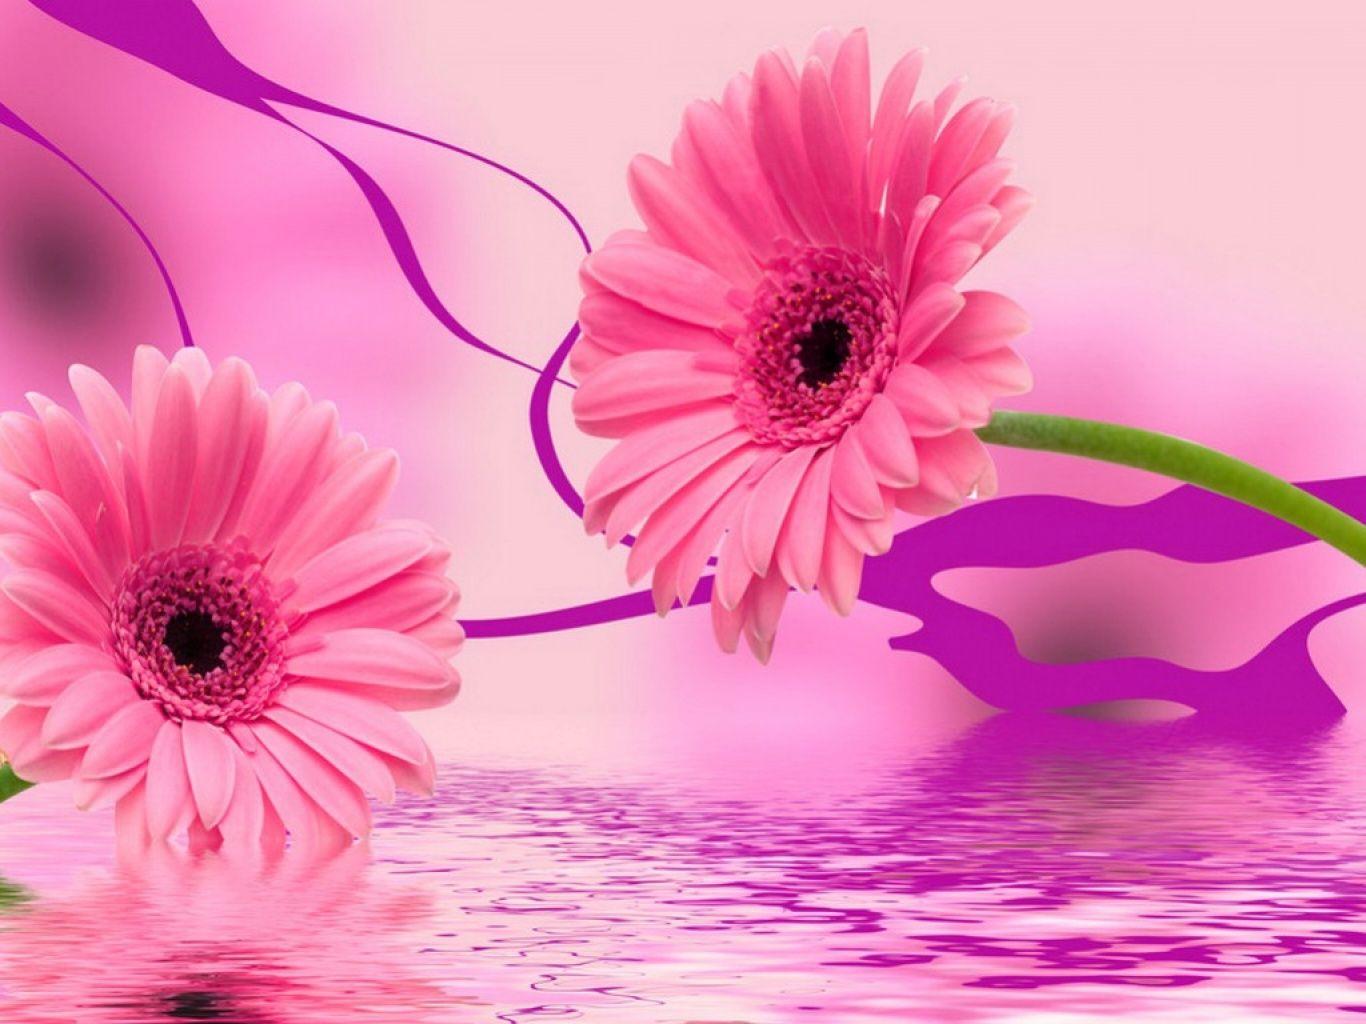 Margaritas rosadas   rosa